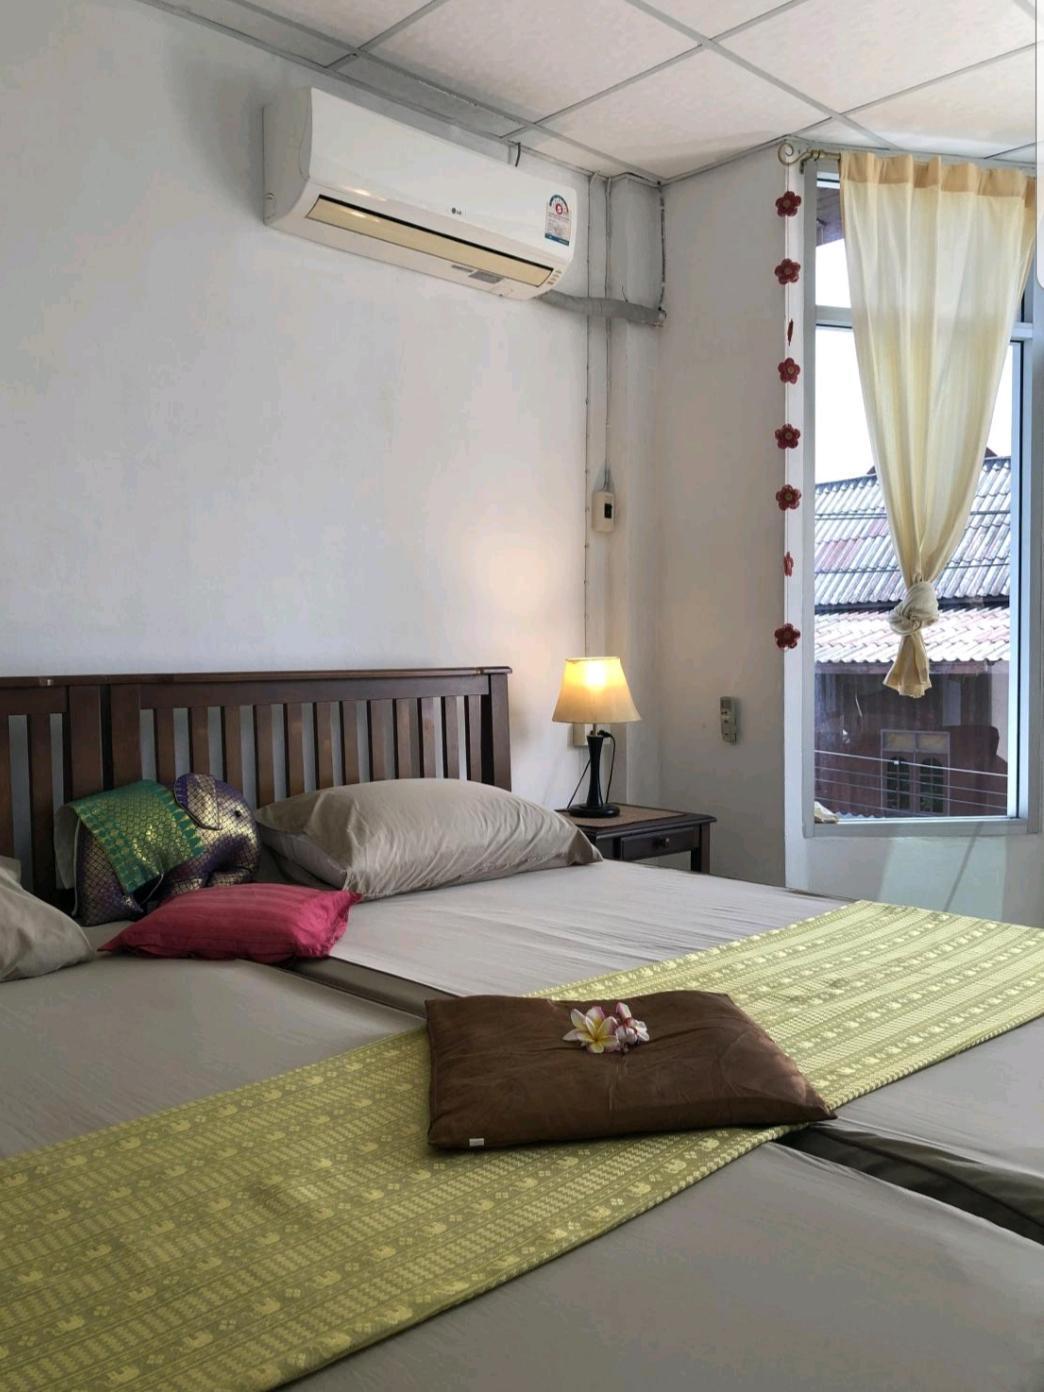 Cozy apartment with roof teracce and pool อพาร์ตเมนต์ 1 ห้องนอน 1 ห้องน้ำส่วนตัว ขนาด 48 ตร.ม. – หาดคลองพร้าว